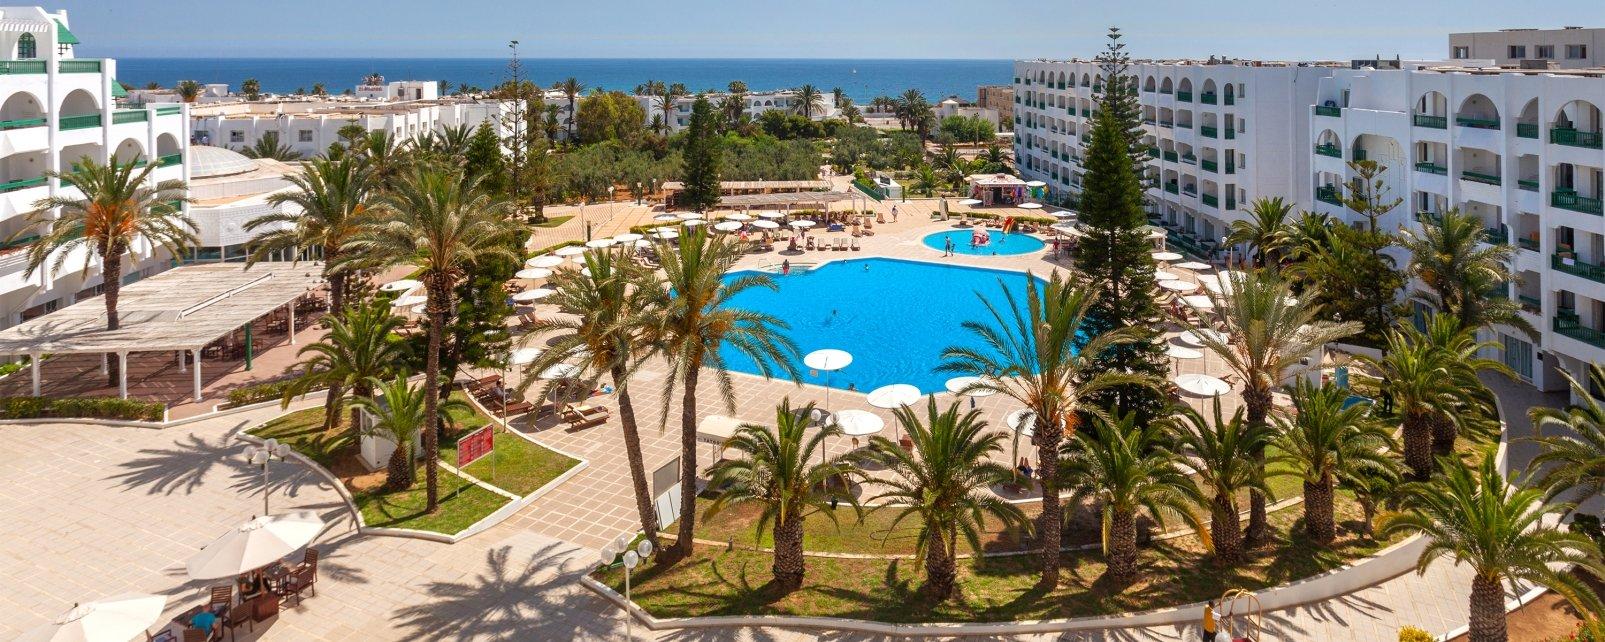 Hotel Hasdrubal Port El Kantaoui